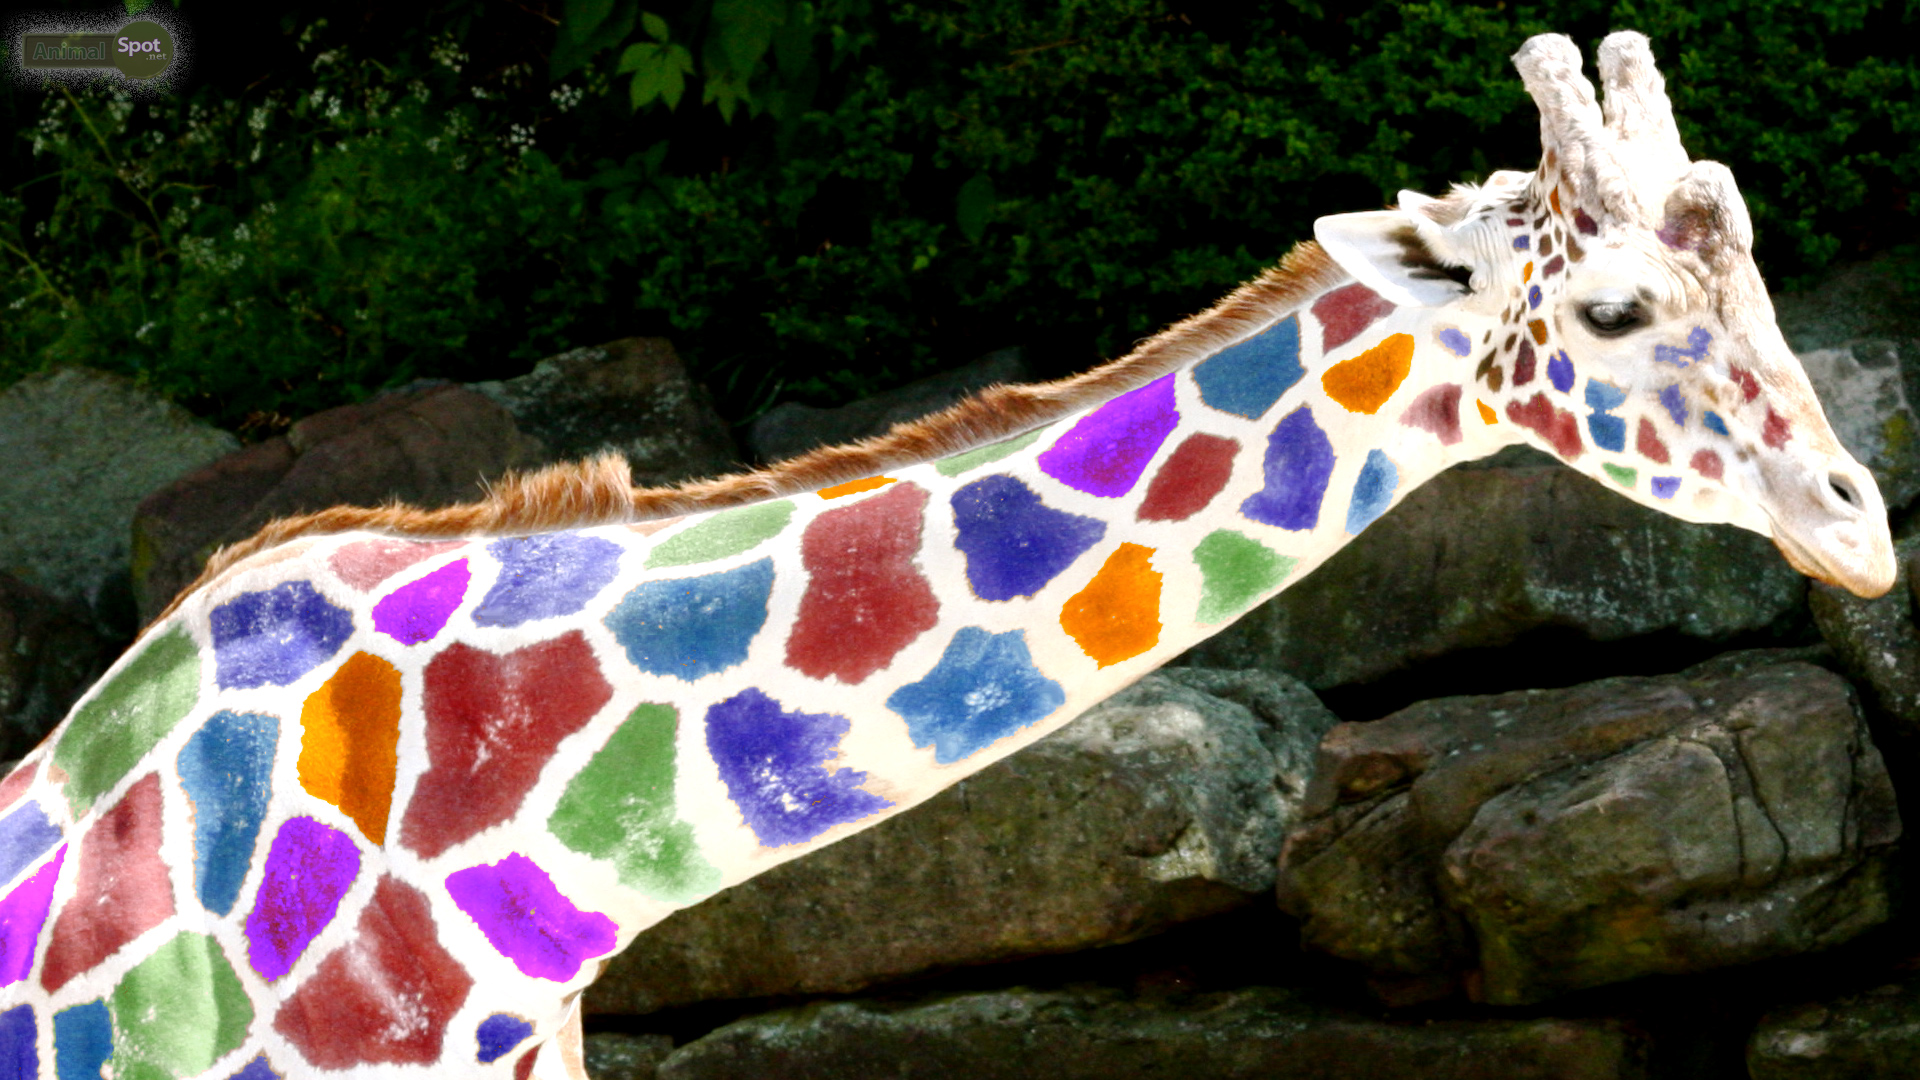 Most Inspiring Wallpaper Colorful Giraffe - Cute-Giraffe-Wallpaper  Pic_339962 .jpg